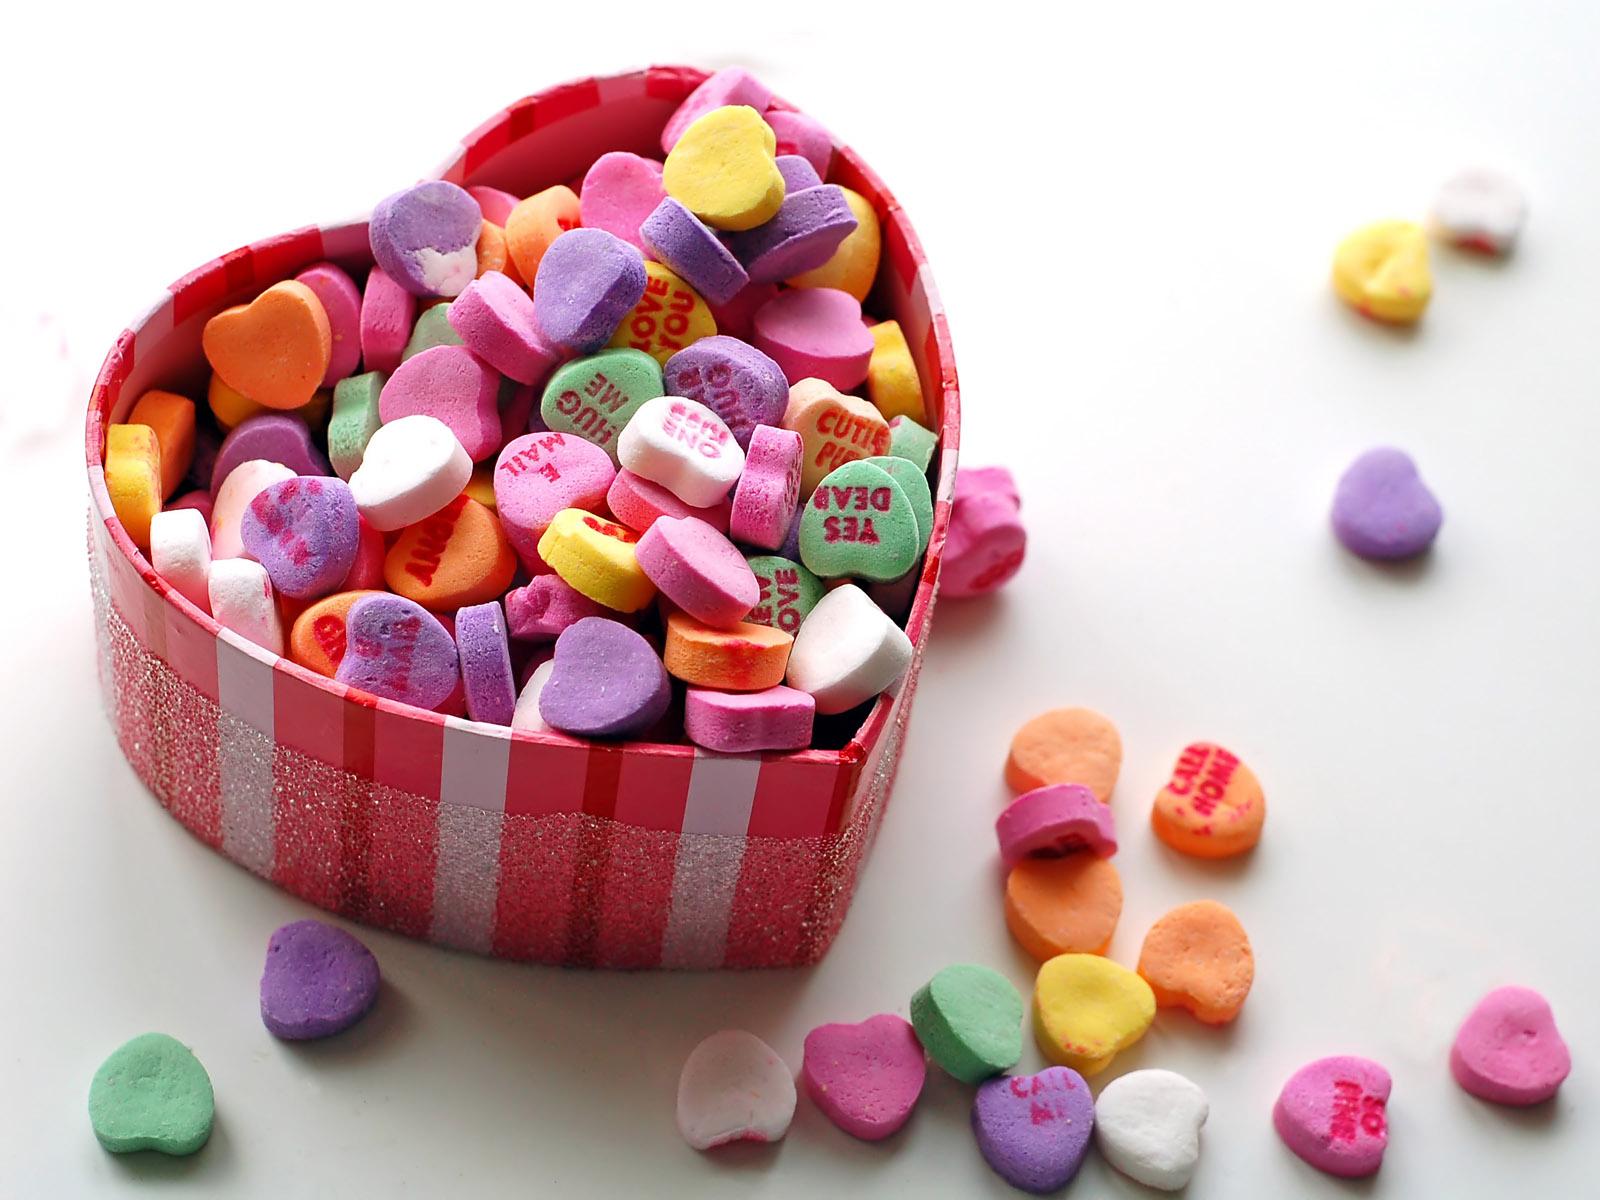 De Valentine's day și Dragobete ne vedem la târg!